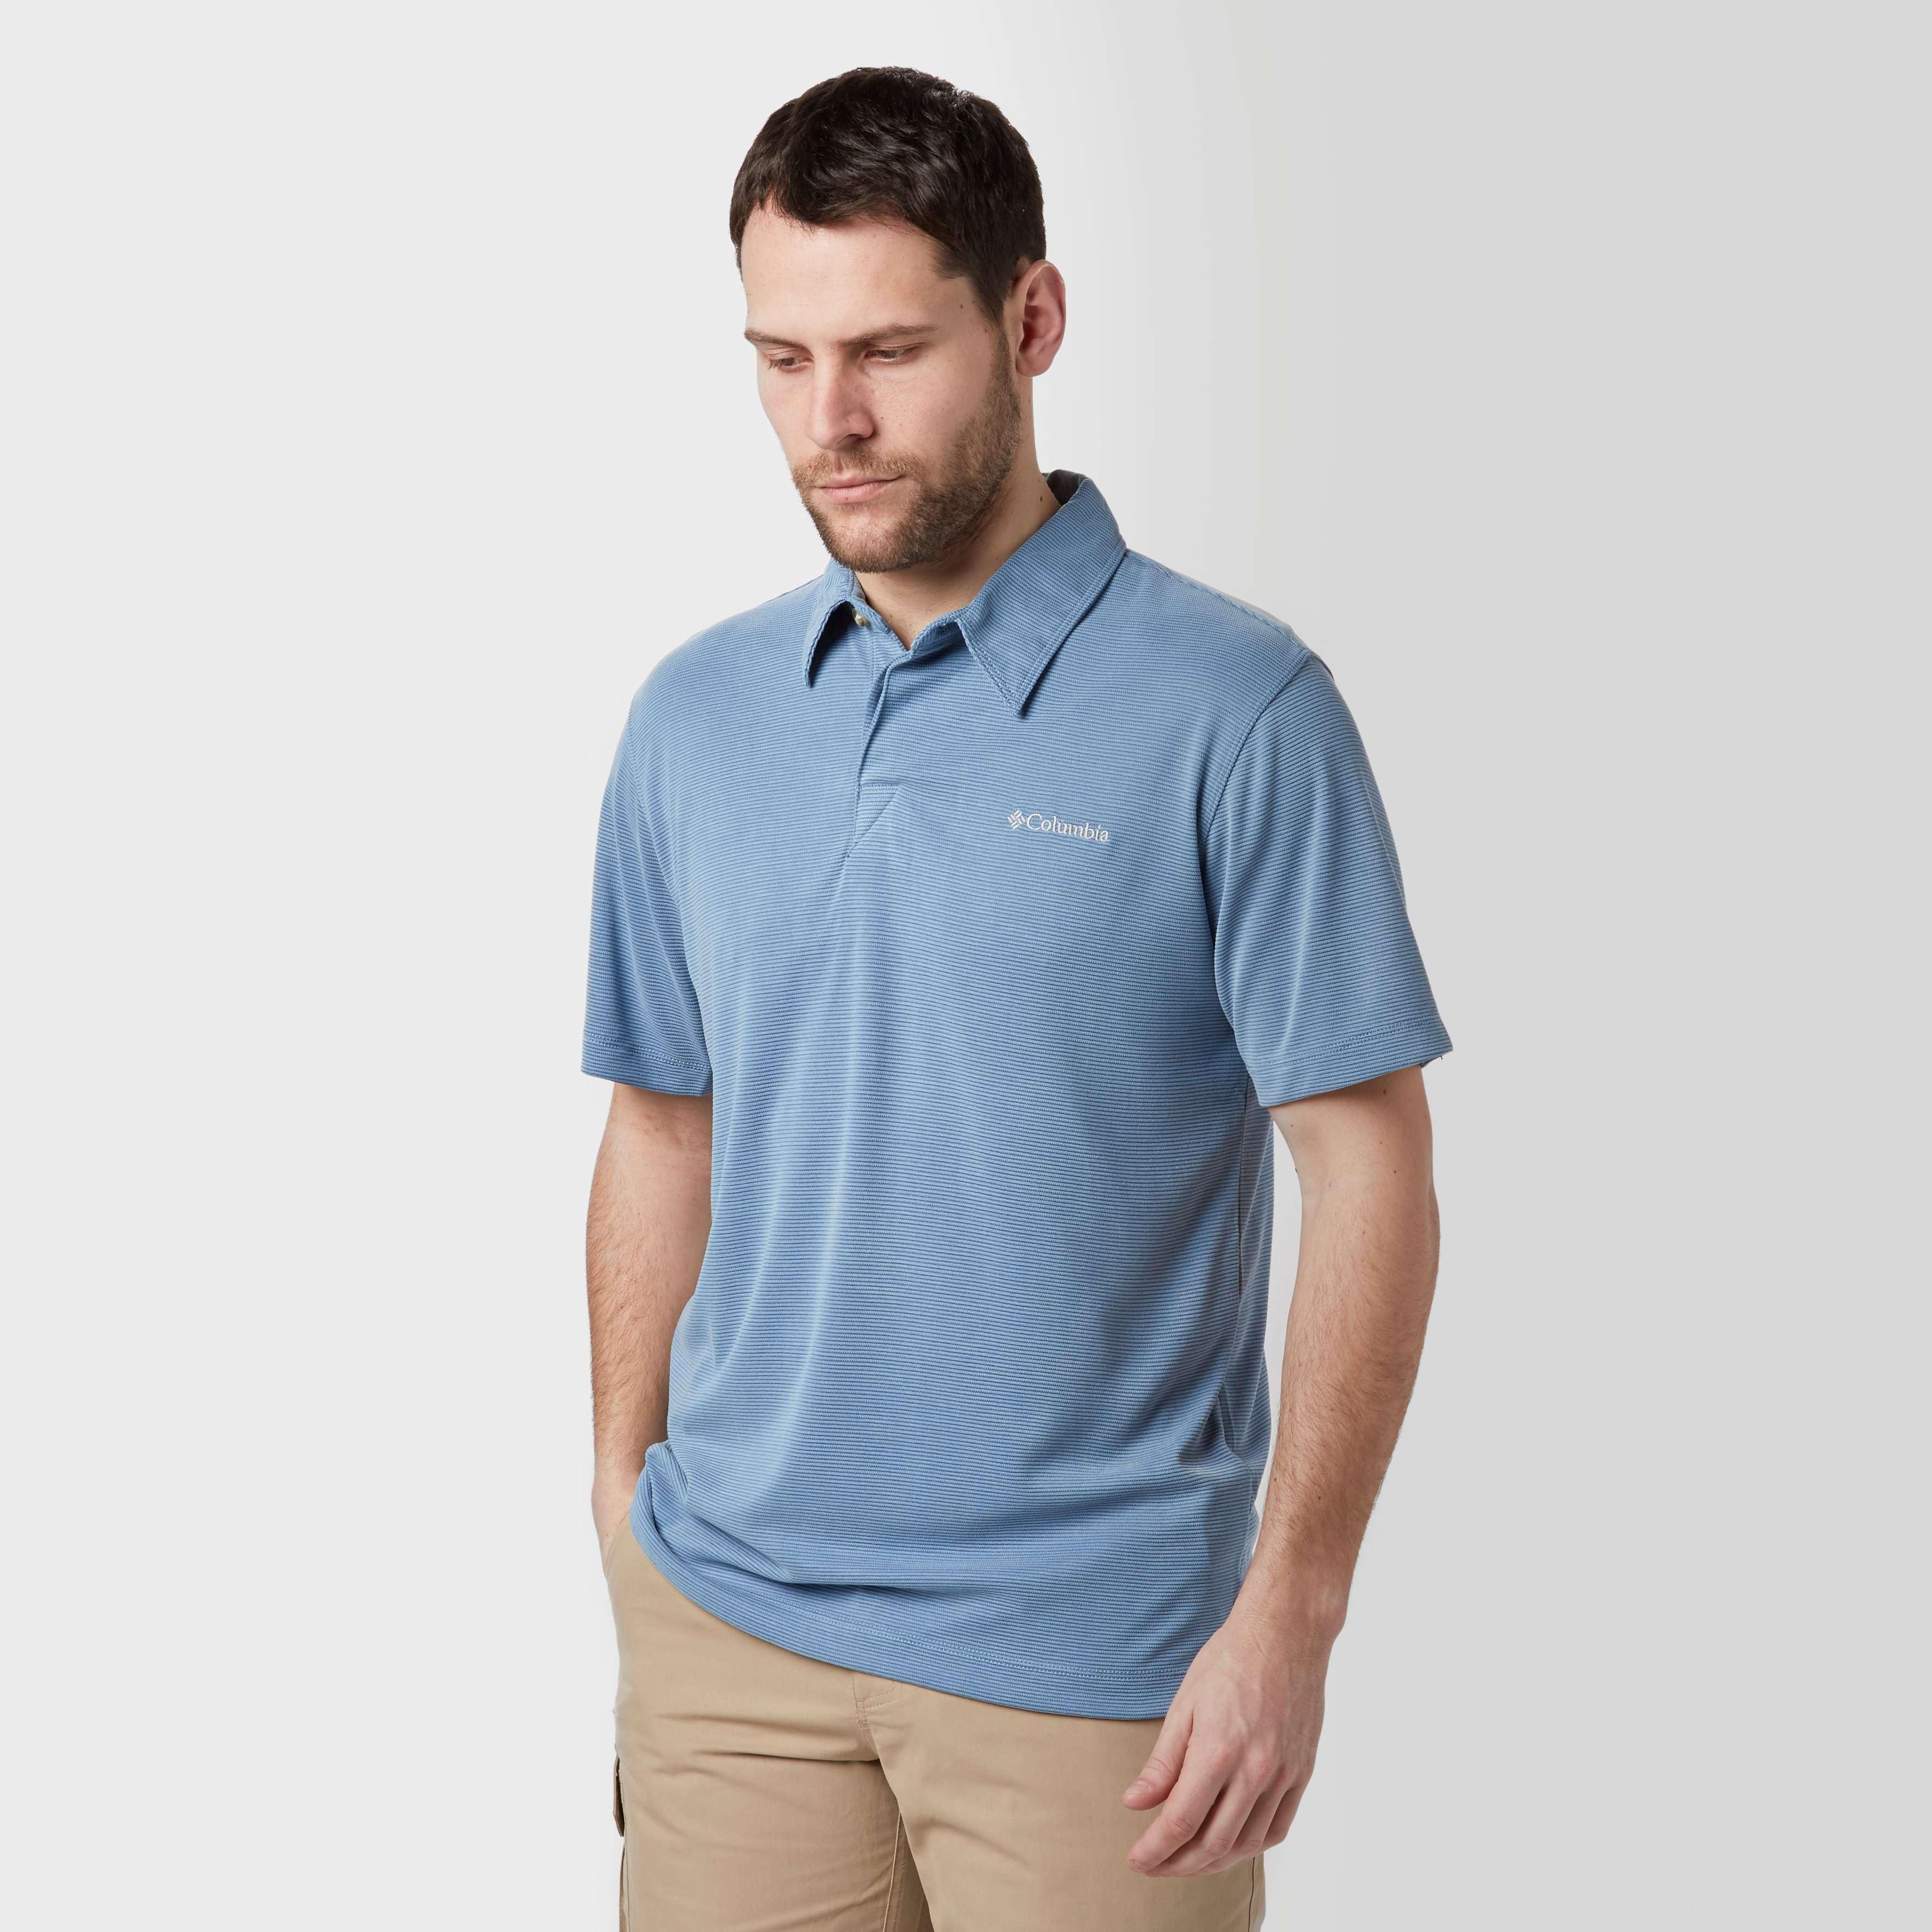 COLUMBIA Men's Sun Ridge Polo Shirt